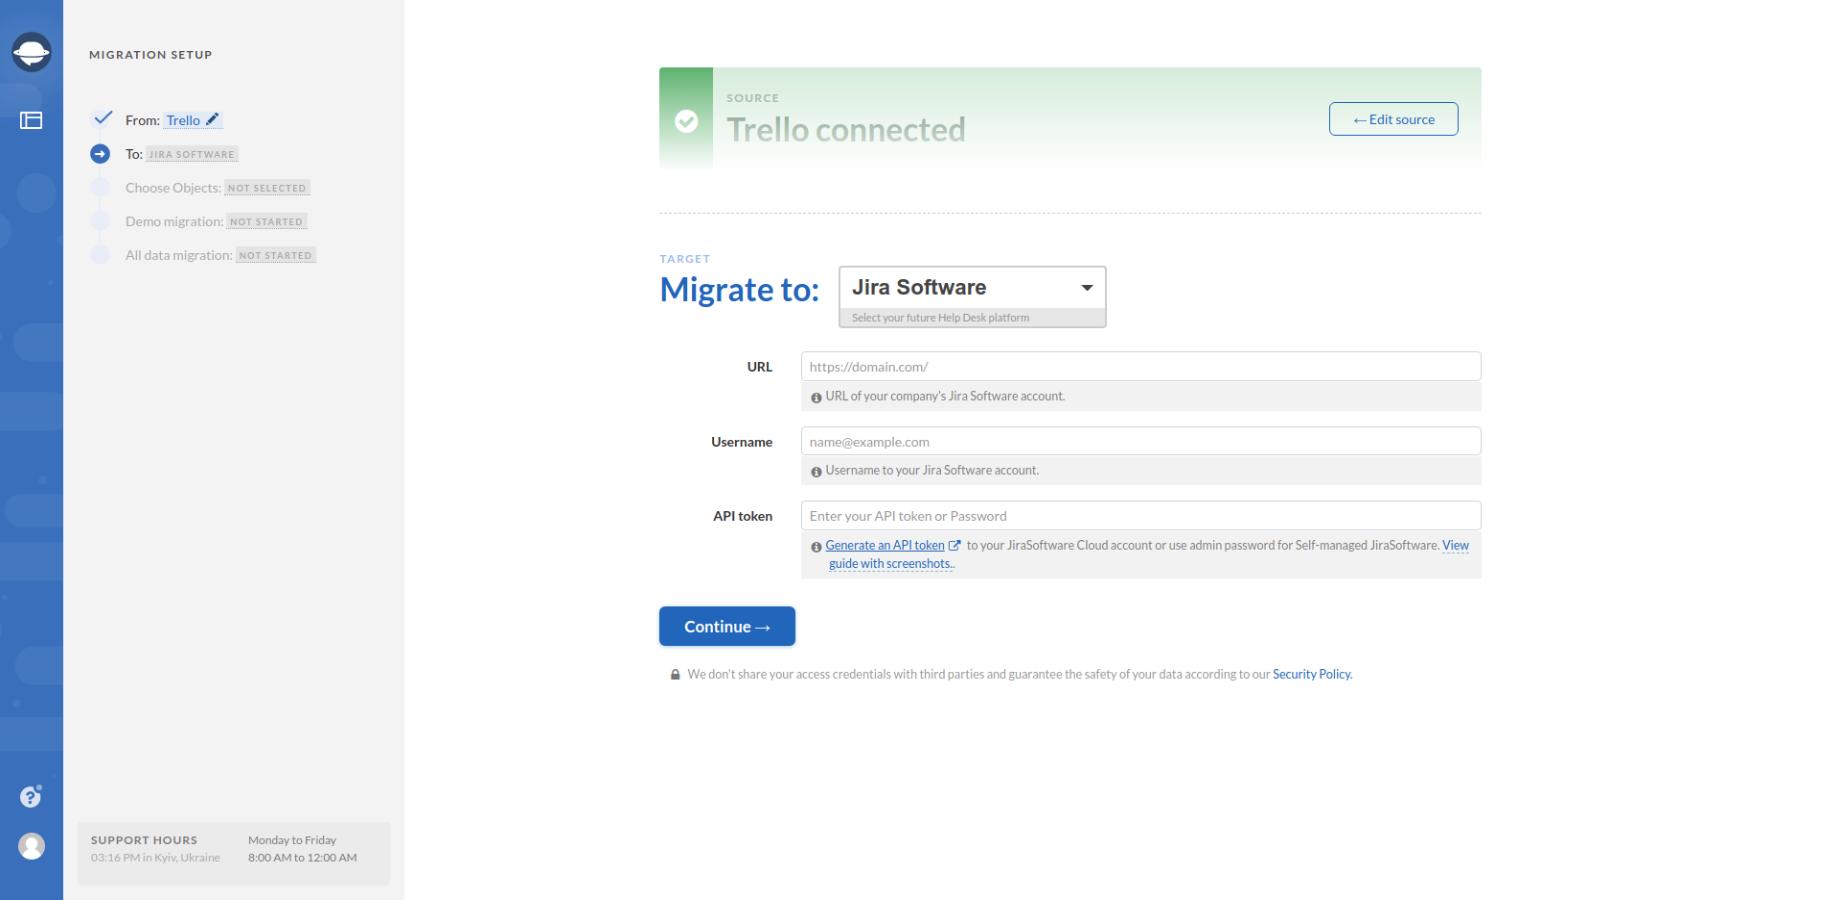 Selecting Jira Software as Target